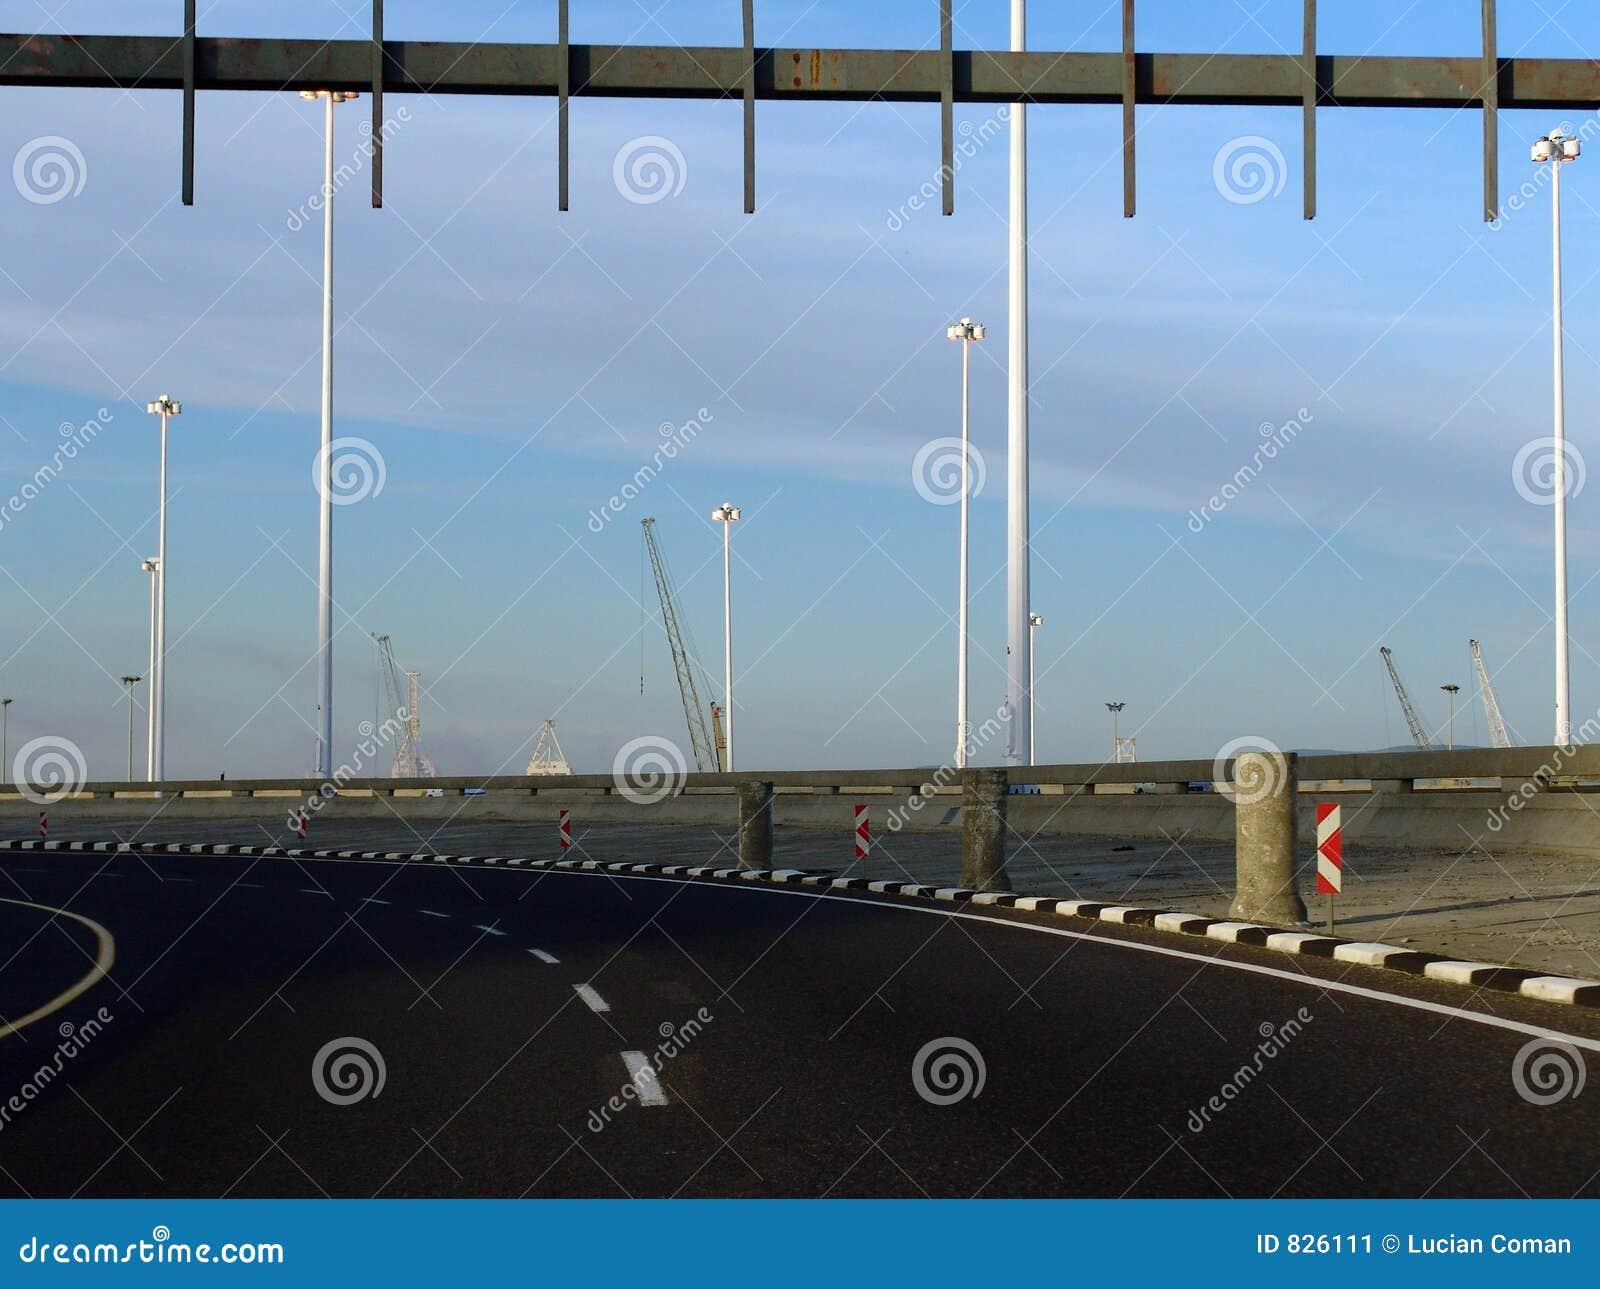 Curving highway